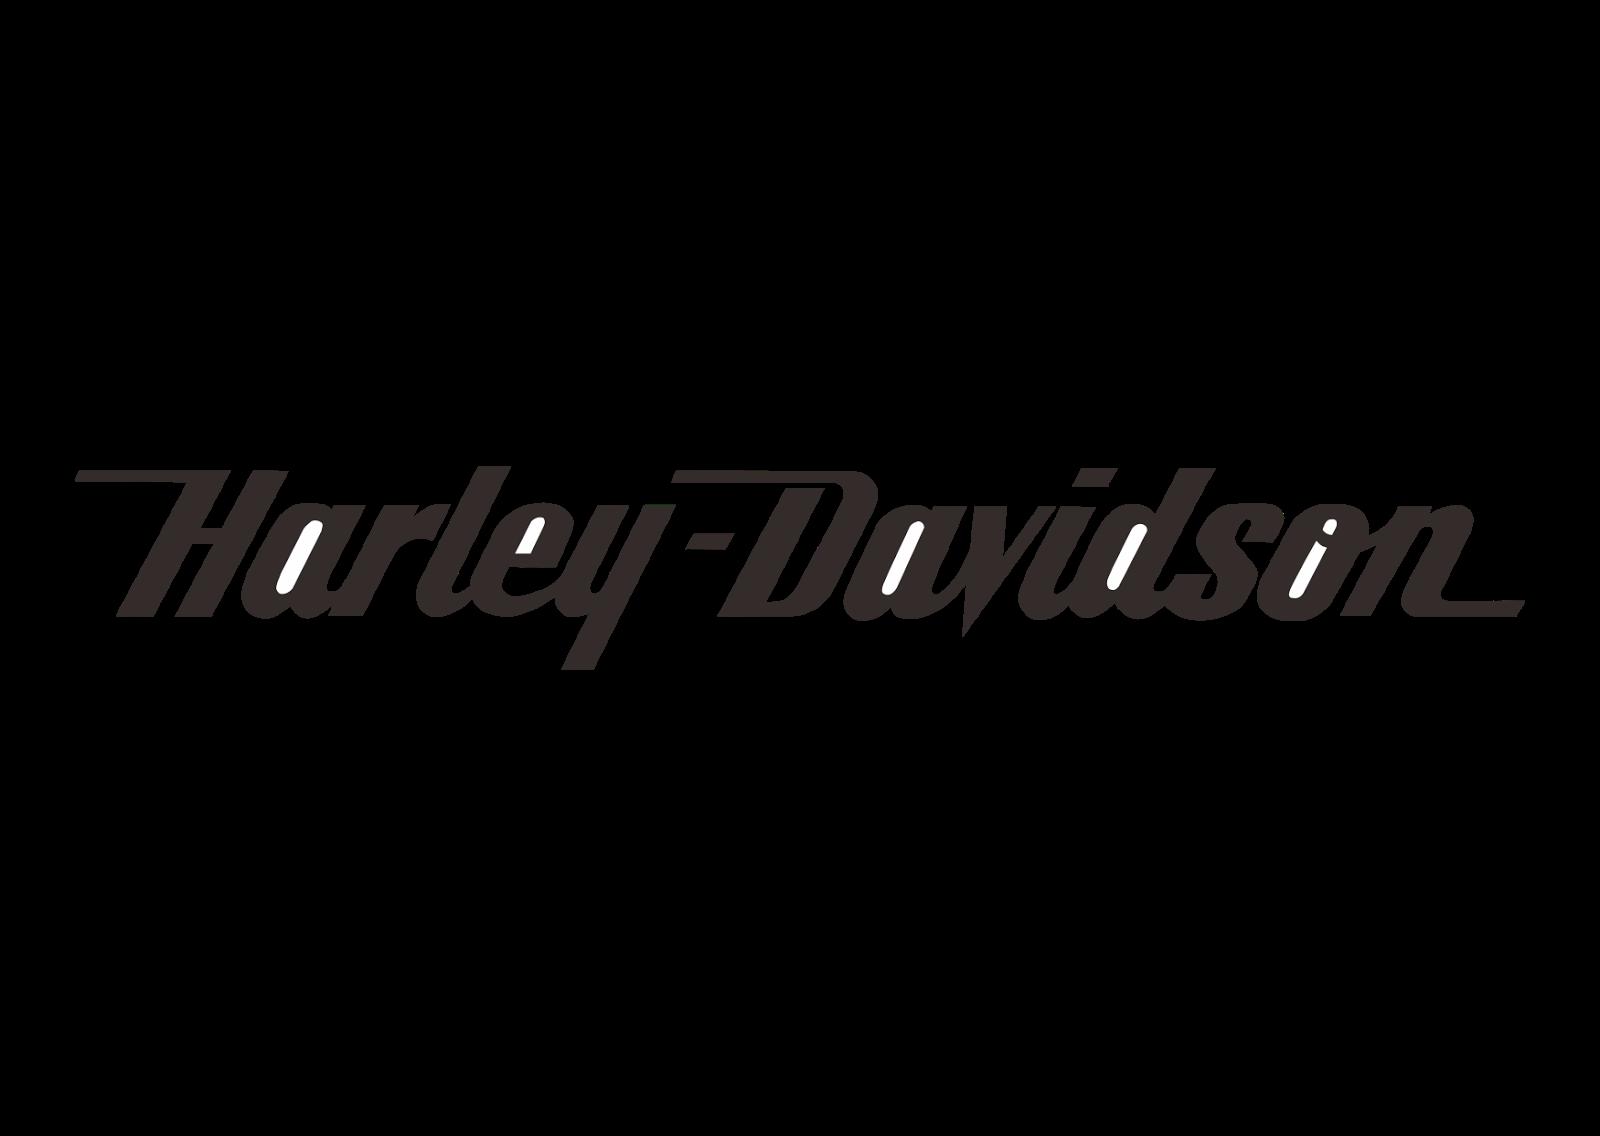 Harley davidson logo black. Motorcycle clipart back